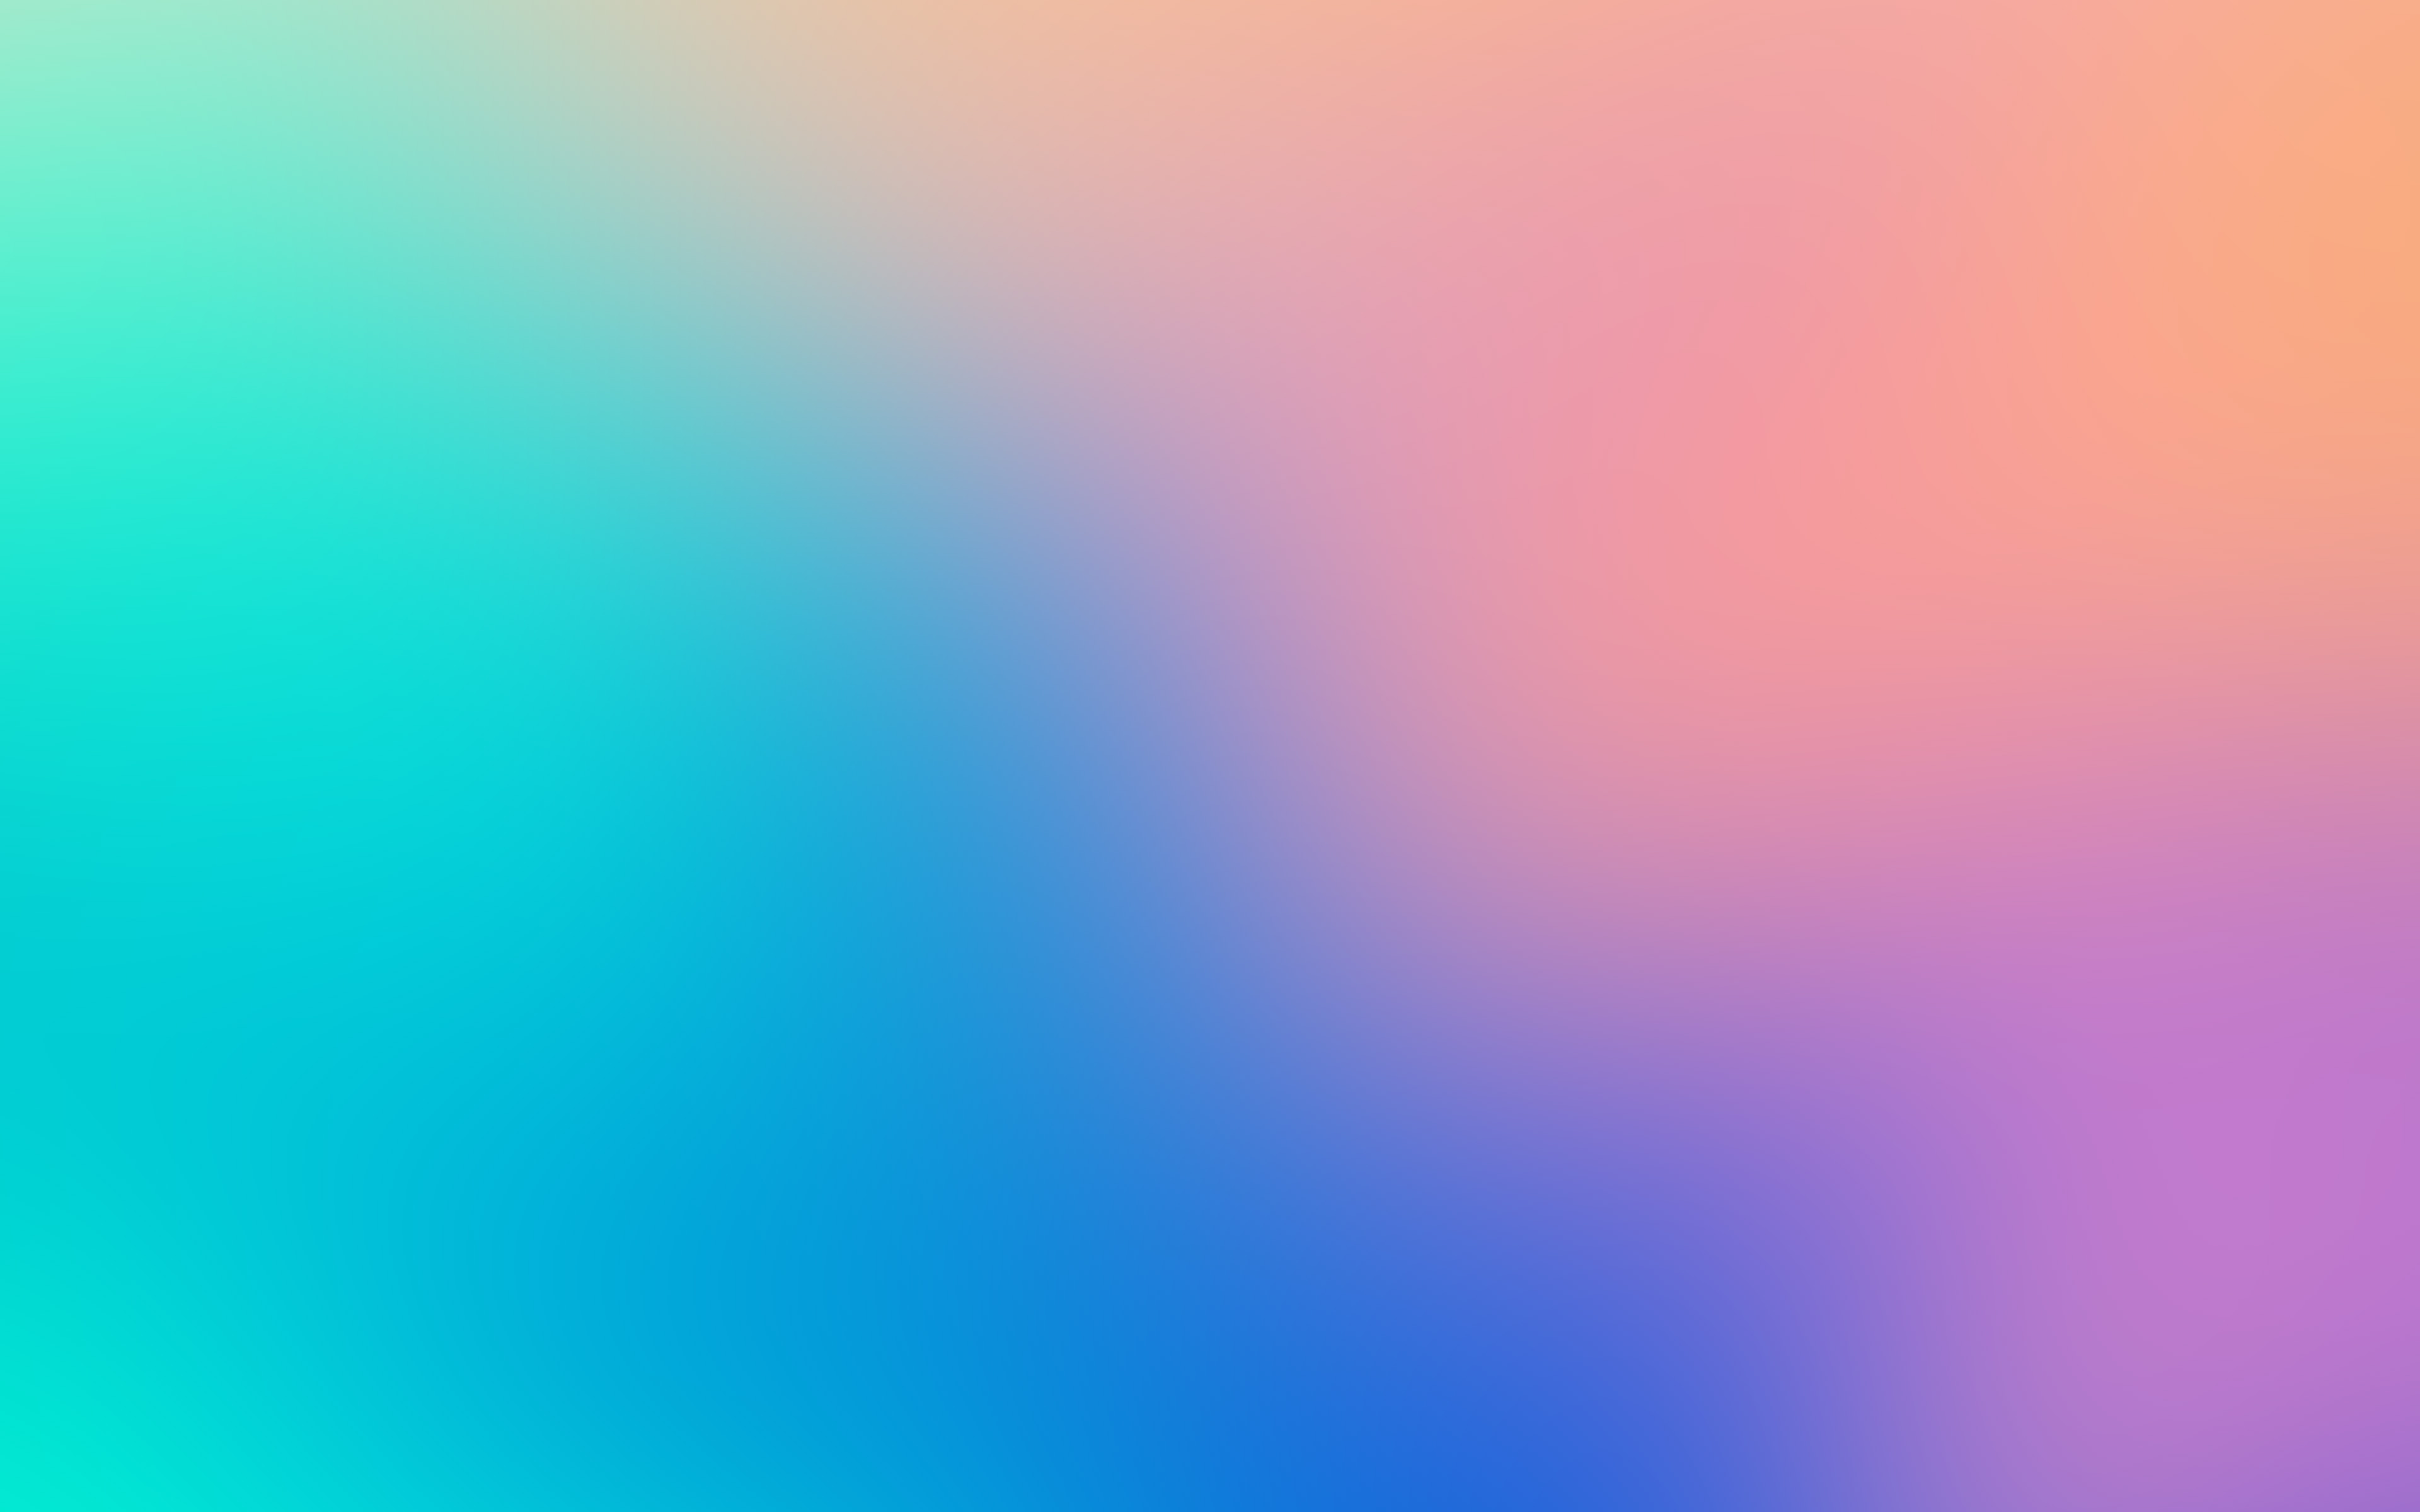 sh72pastelicecreamgradationblurwallpaper